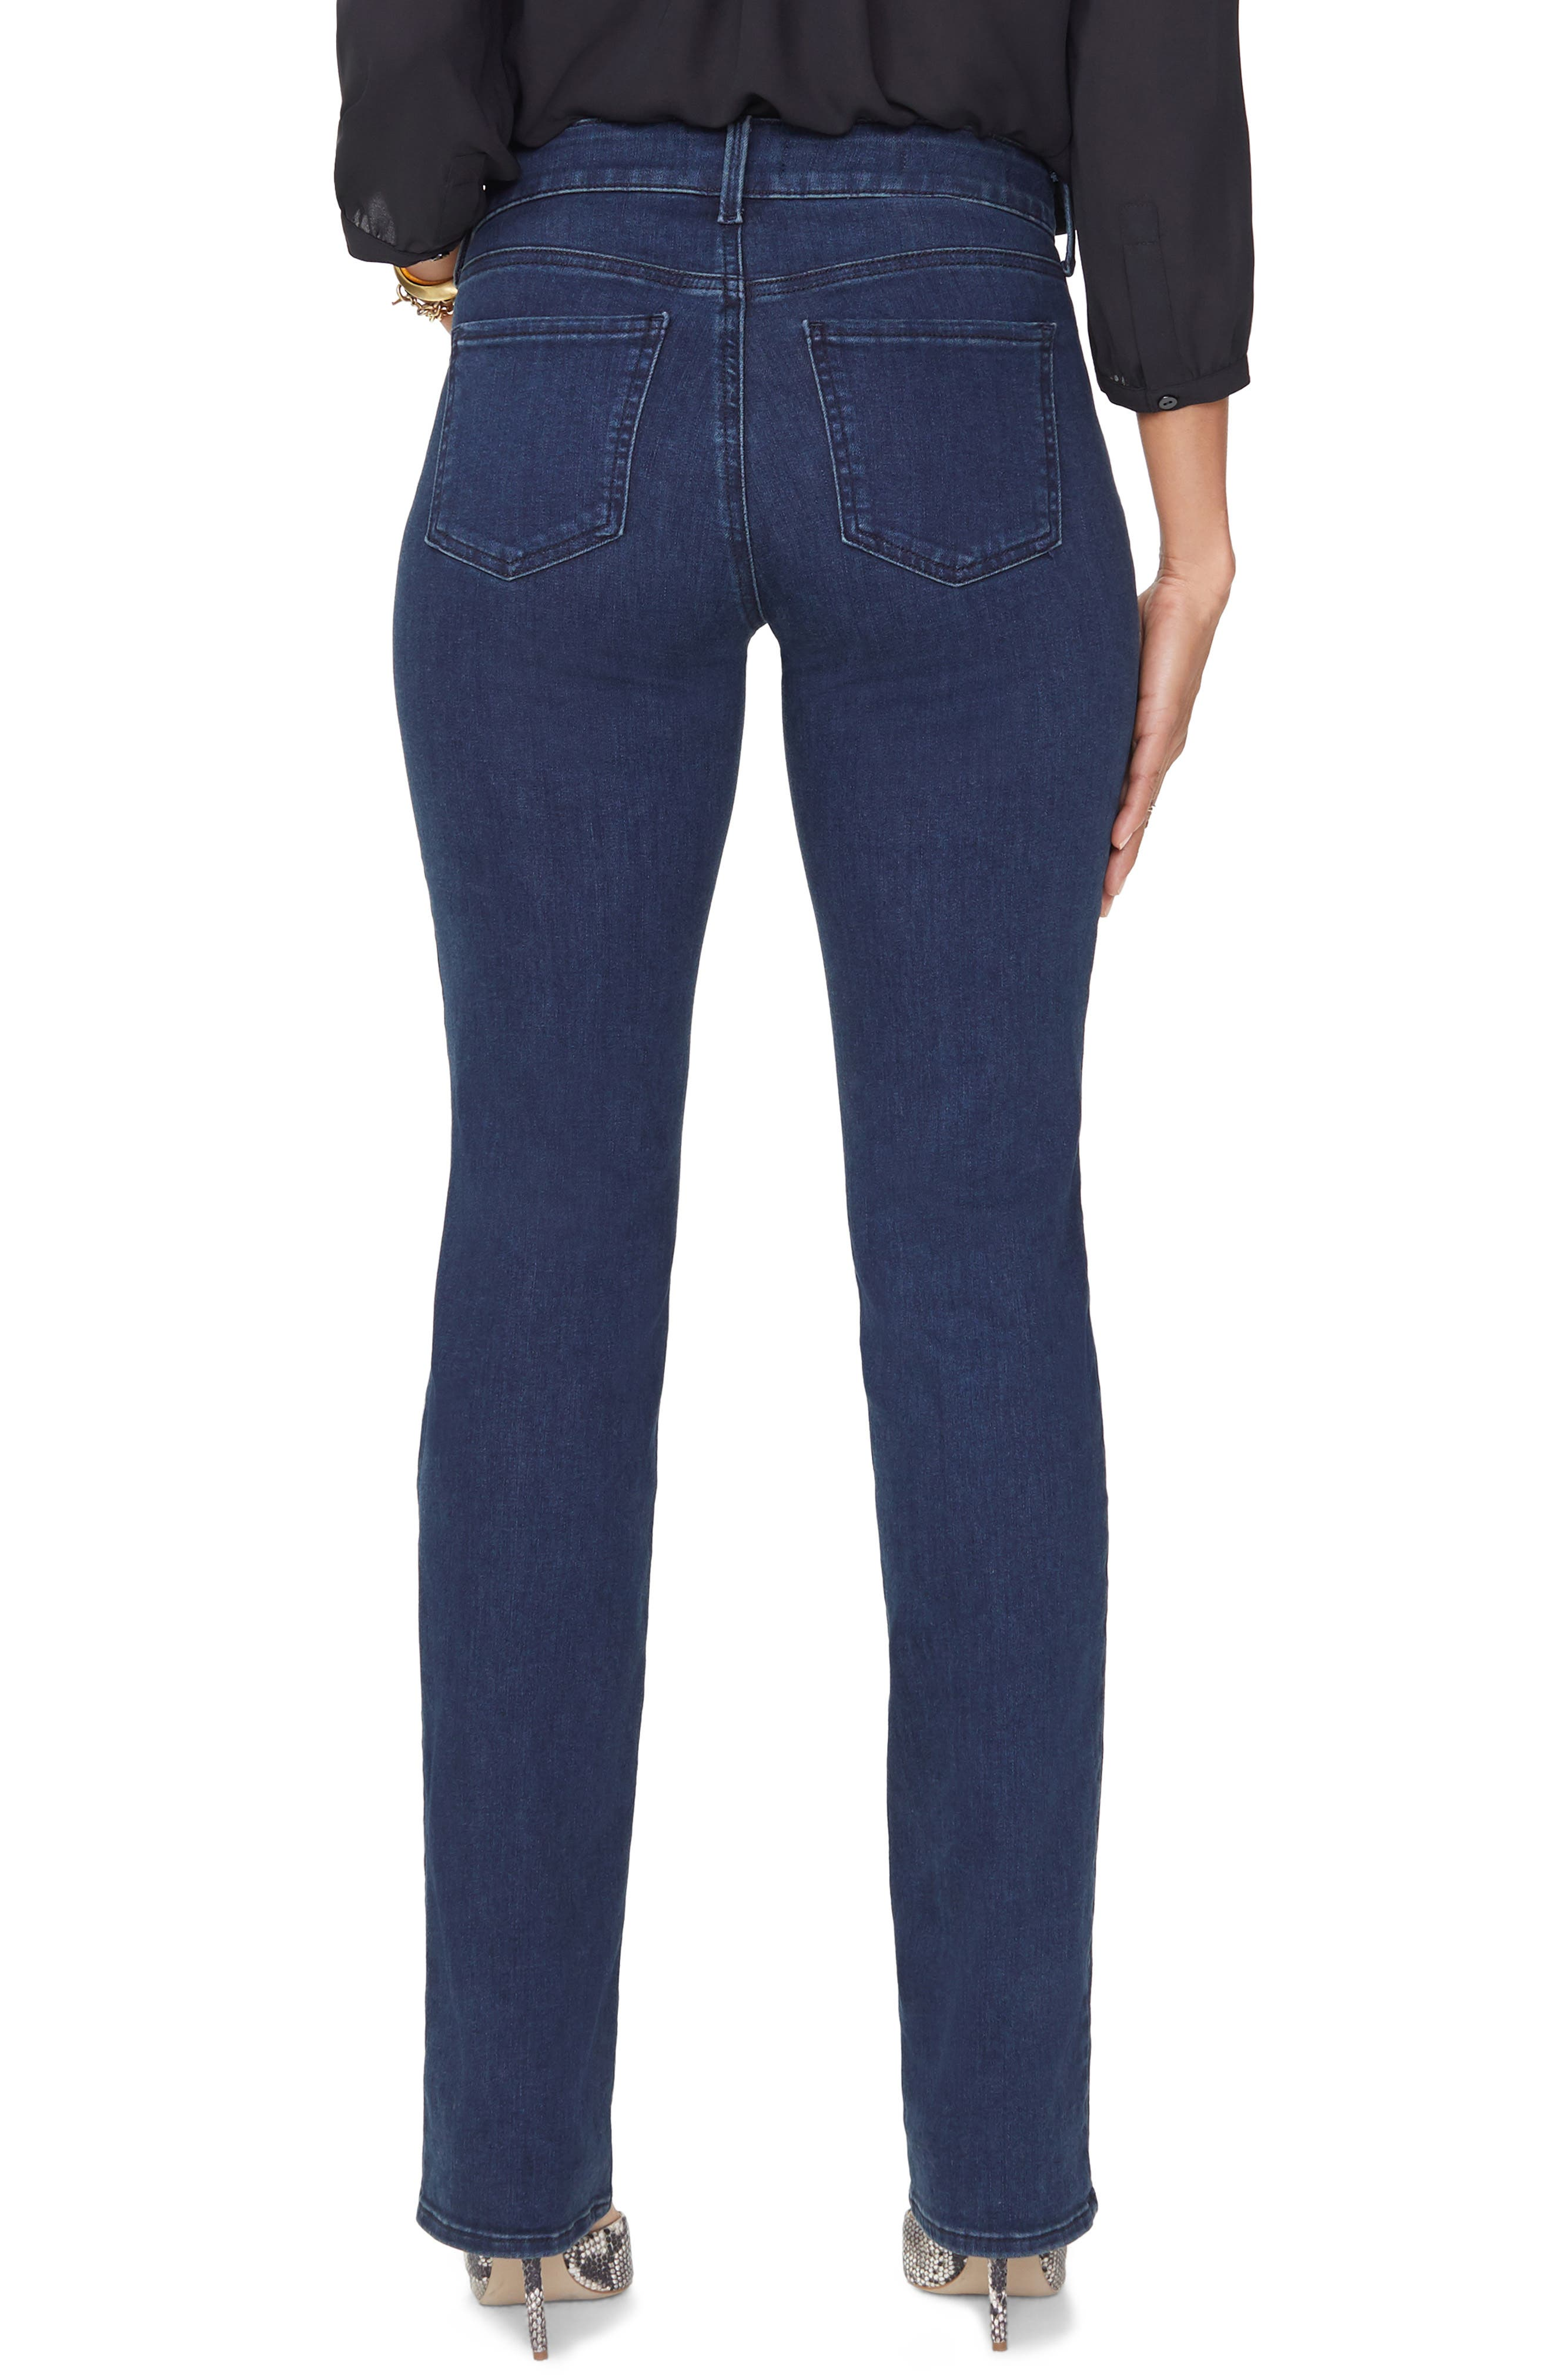 NYDJ, Marilyn Stretch Straight Leg Jeans, Alternate thumbnail 2, color, 405